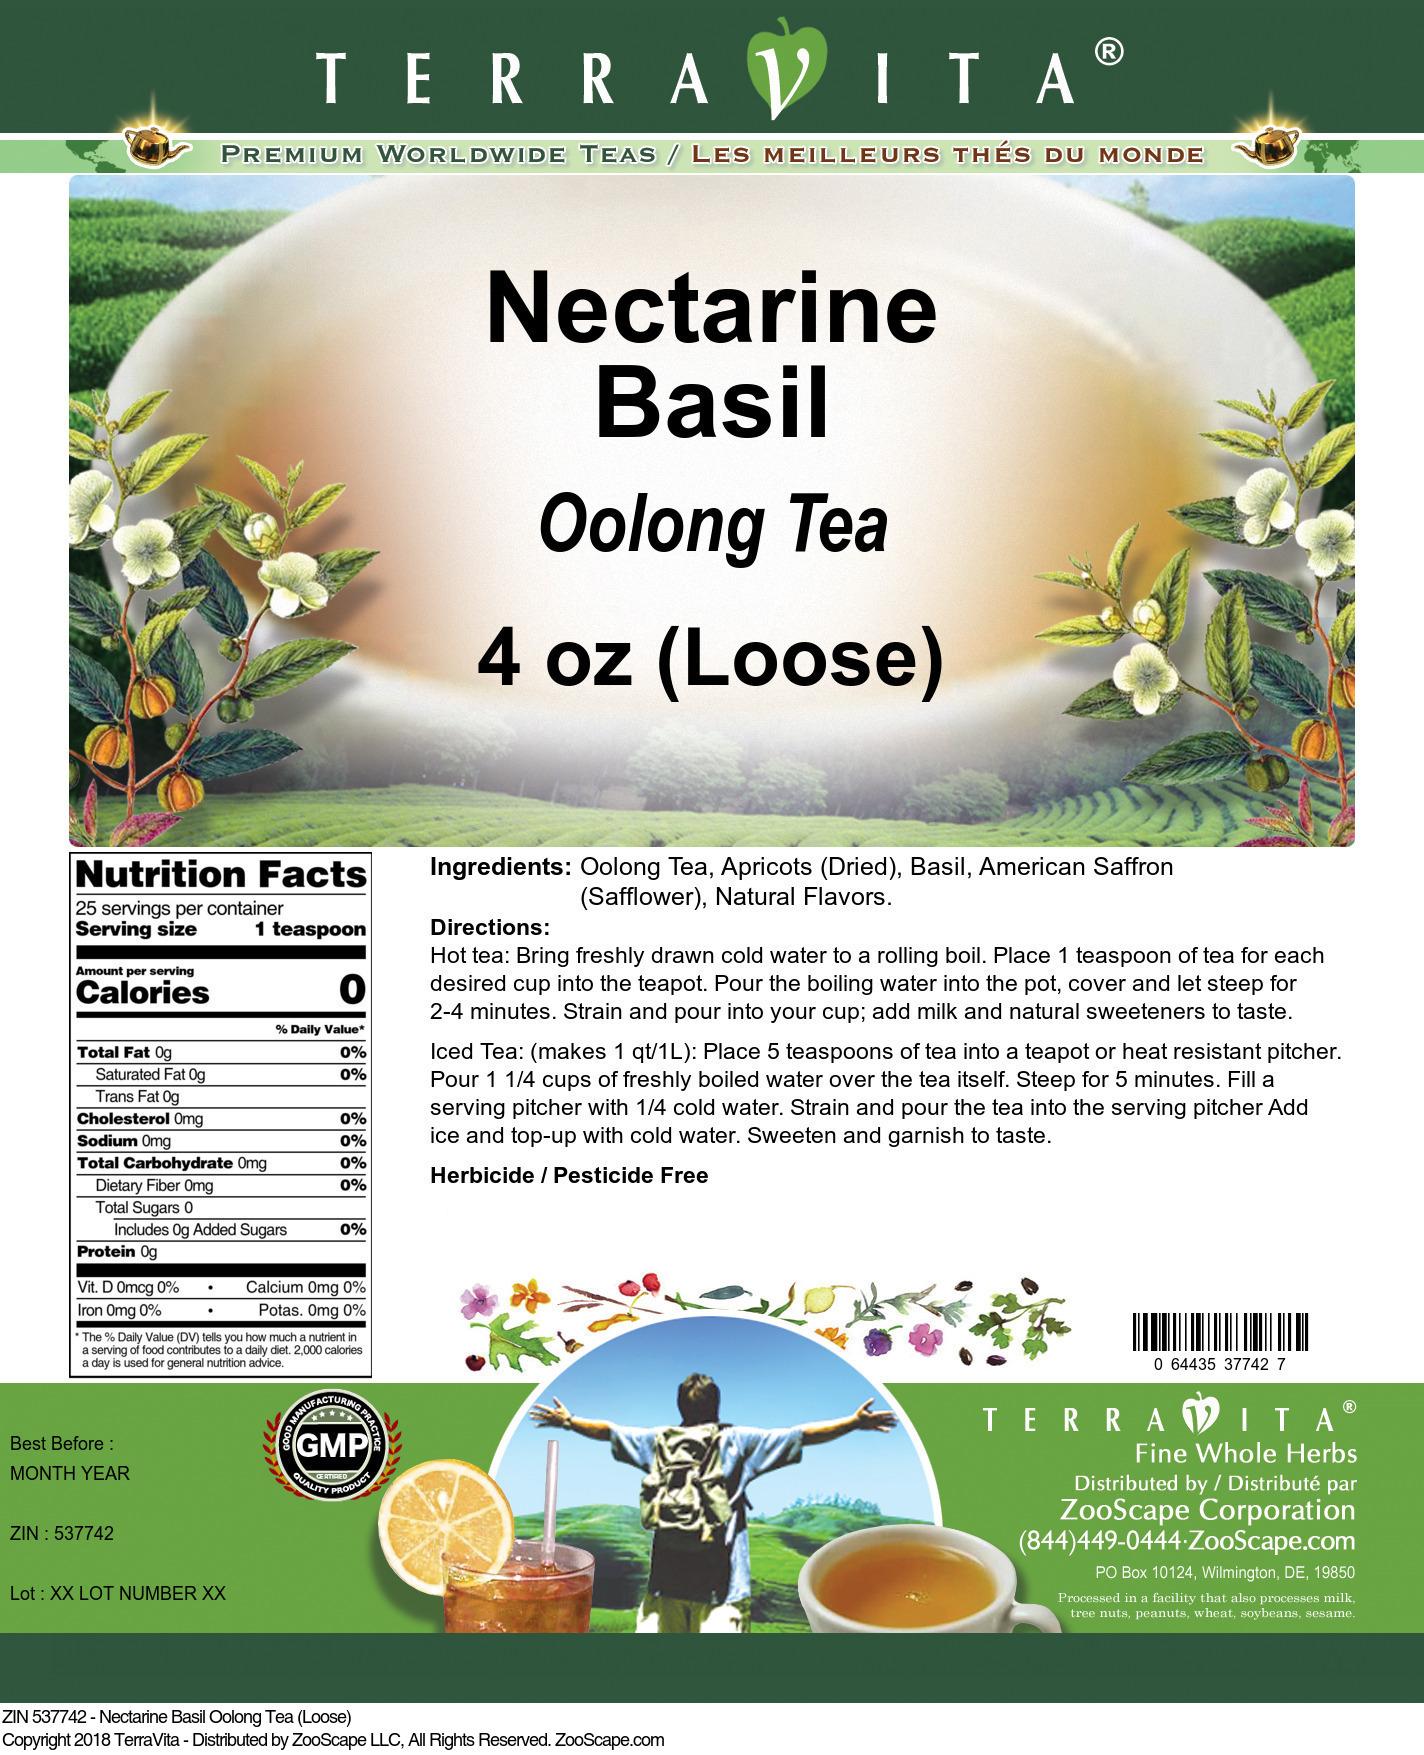 Nectarine Basil Oolong Tea (Loose)